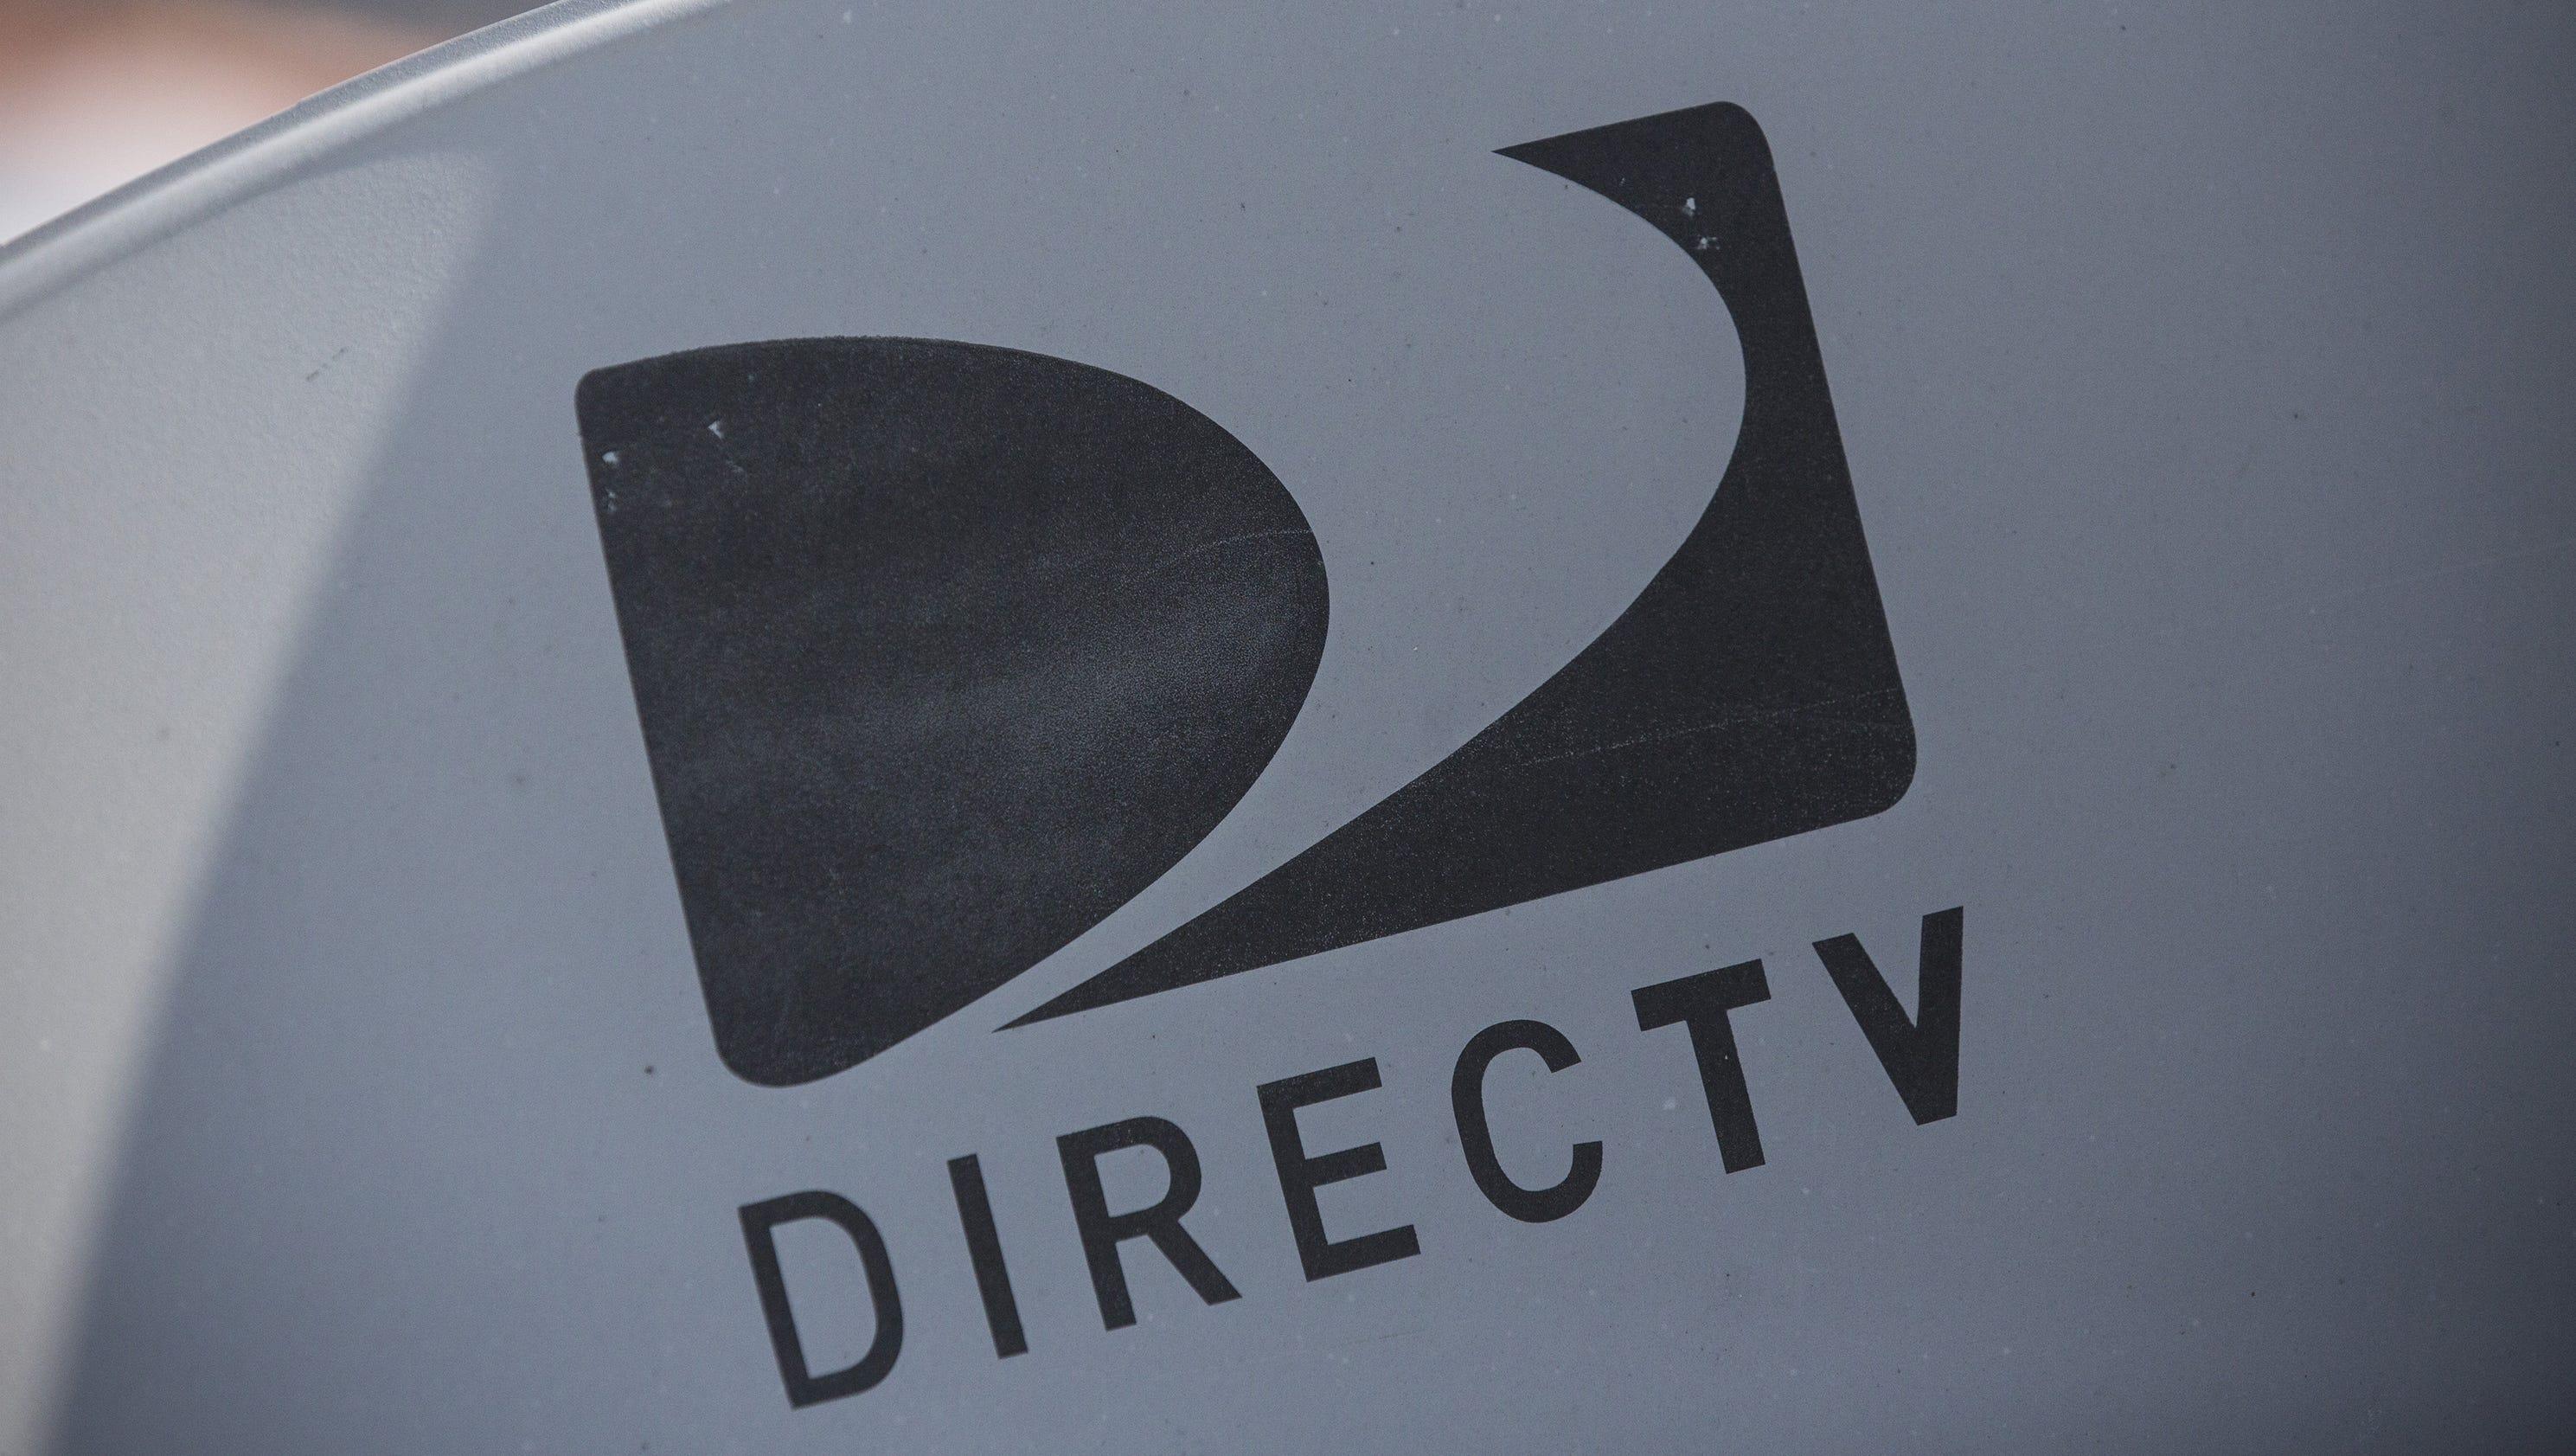 No direct way to duck directvs box rental fee solutioingenieria Choice Image